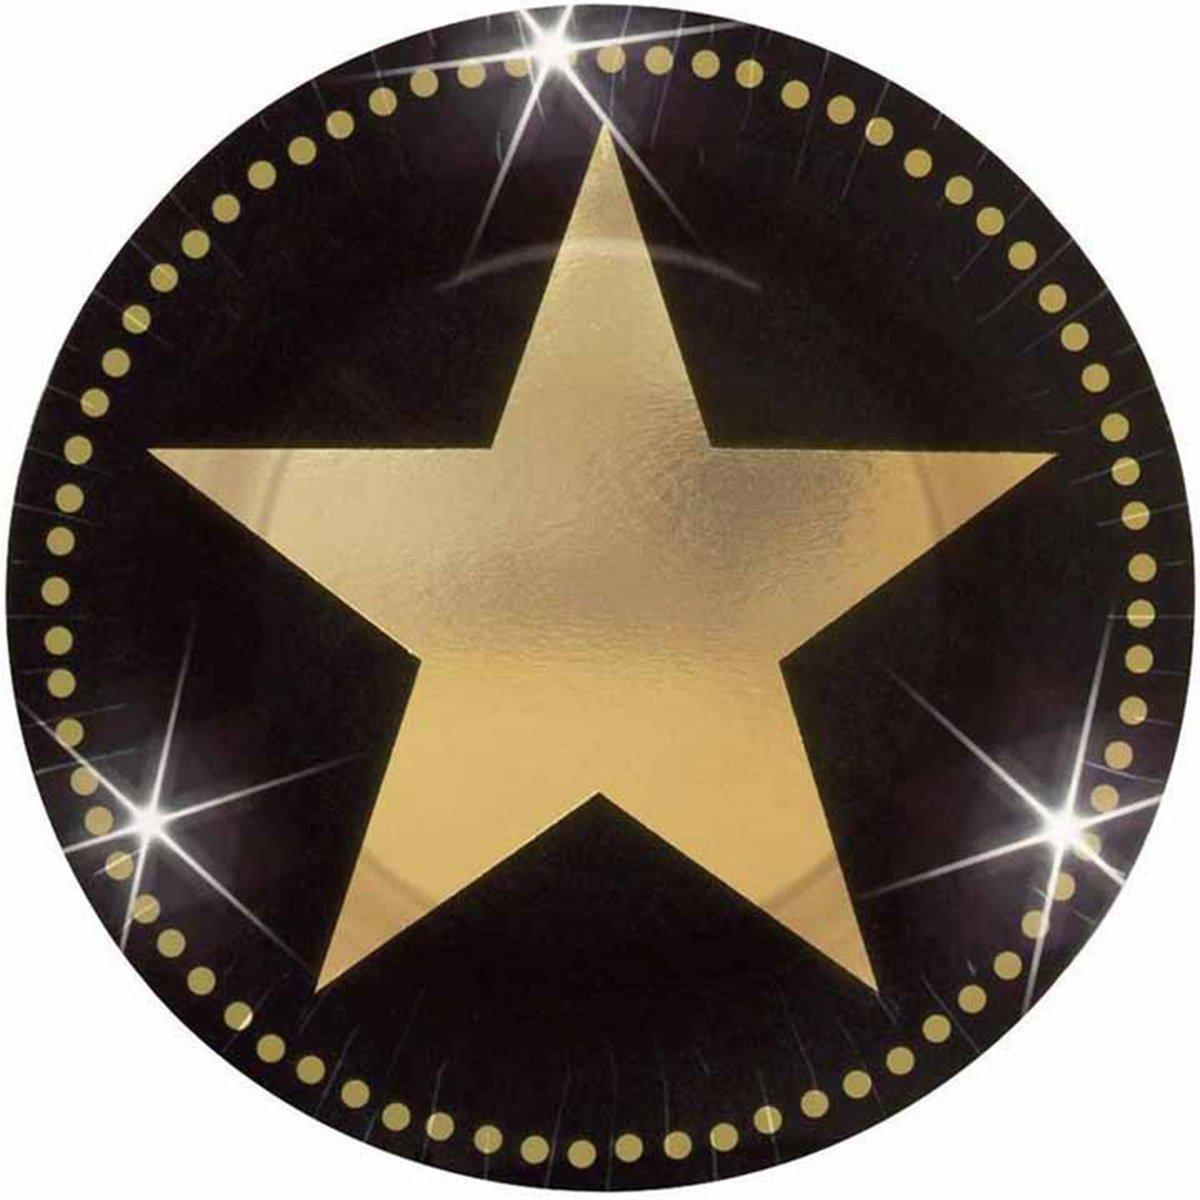 Тарелка со звездой